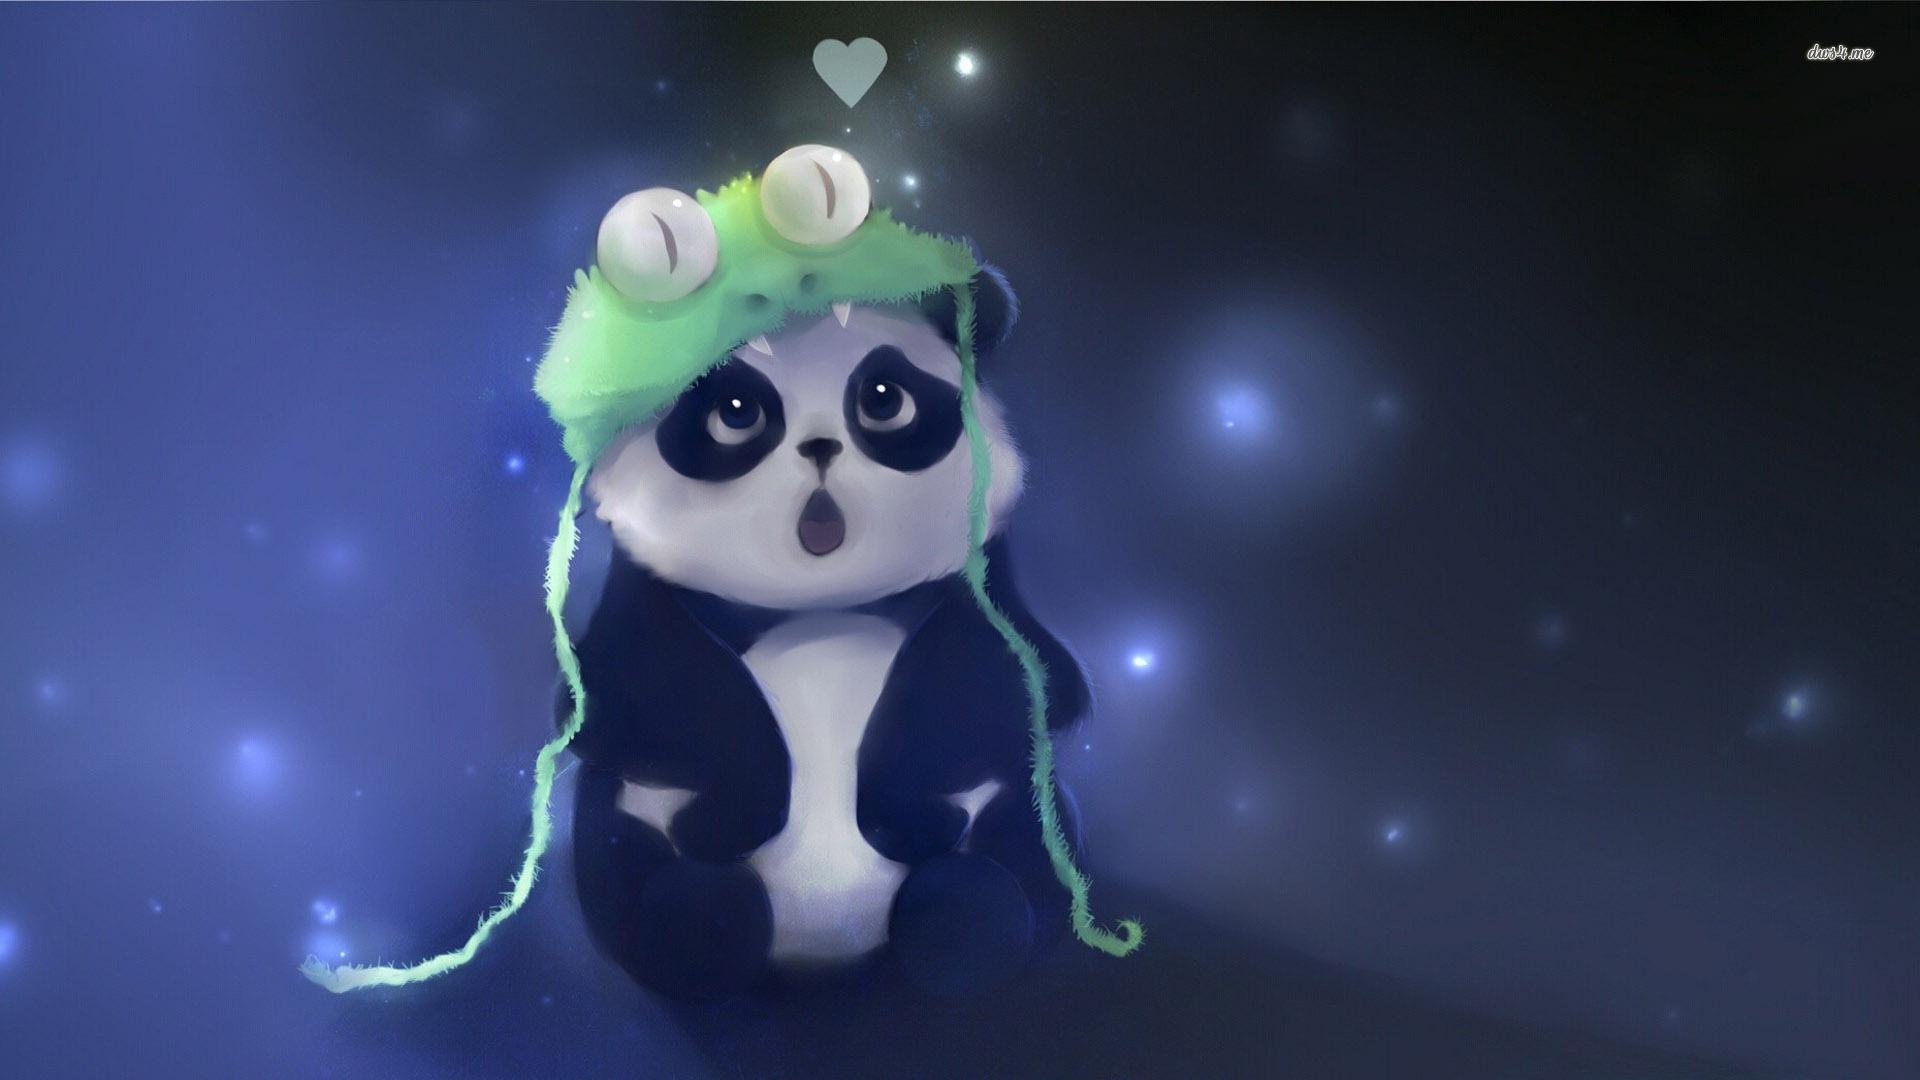 Fantastic Panda Wallpaper Te Panda Wallpaper Hd Resolution Anime Kawaii Iphone Tumblr S Cute 1920x1080